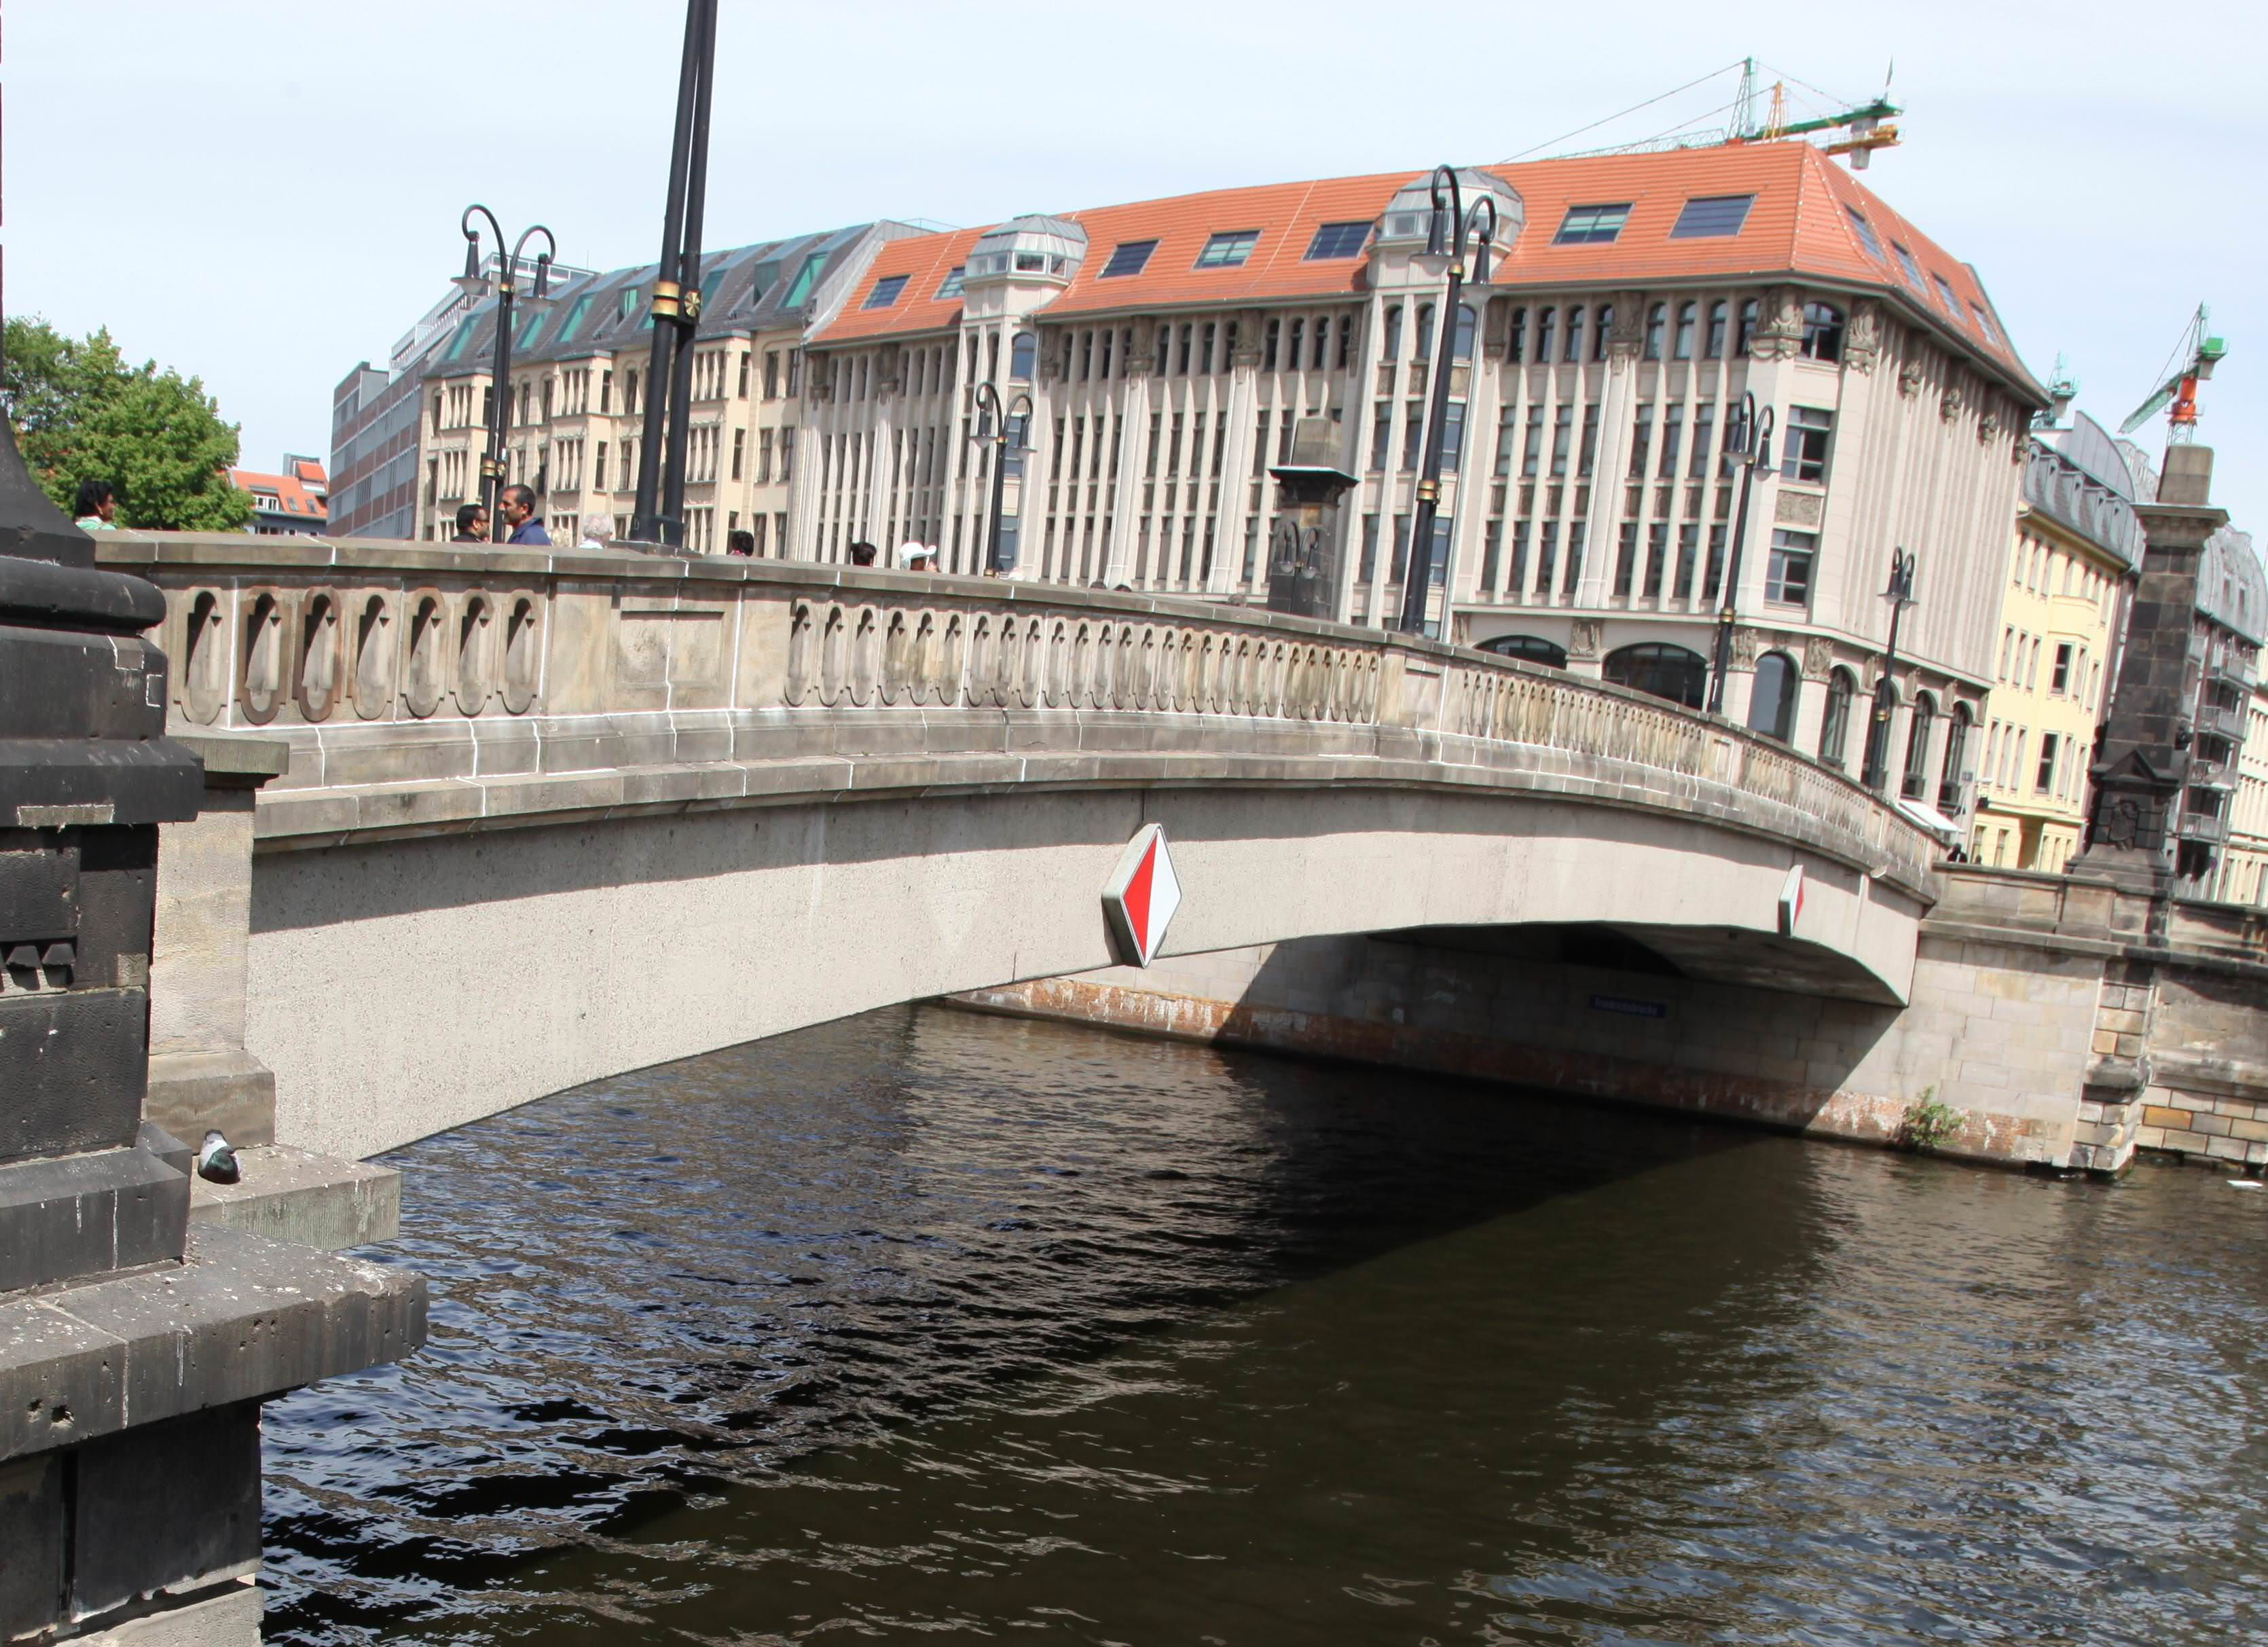 Brückenseiten kritisch betrachtet